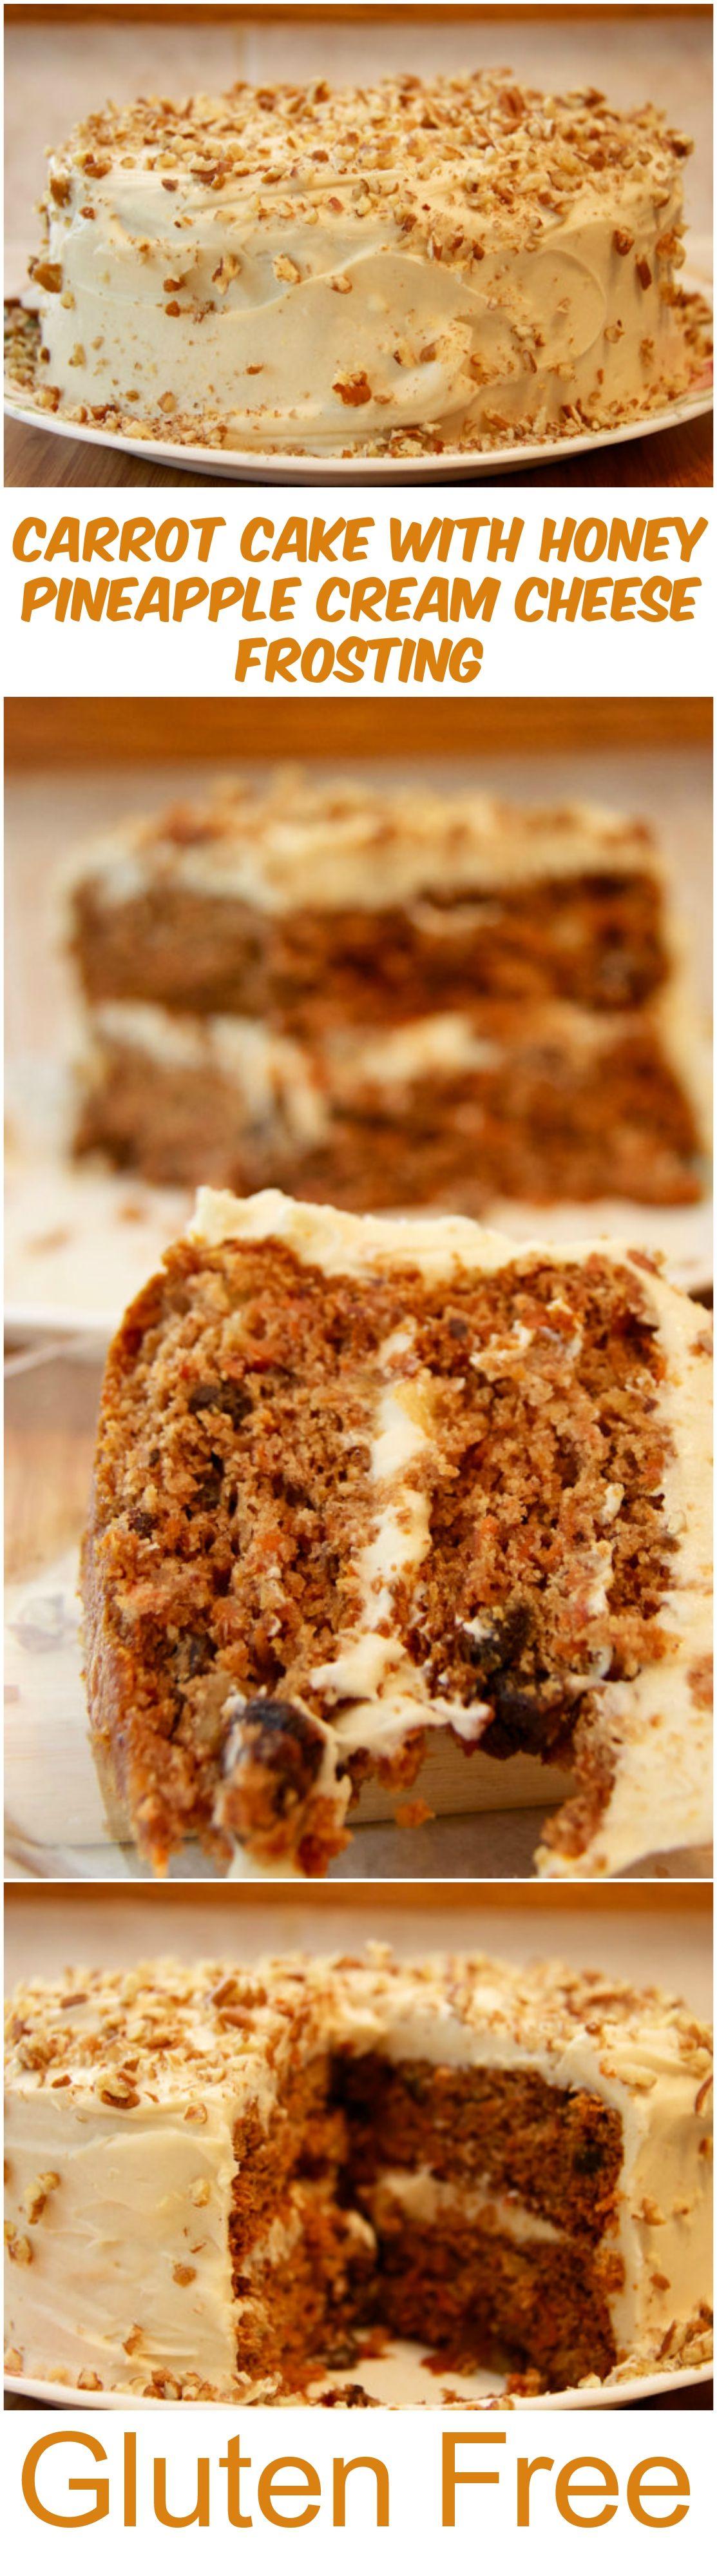 Gluten-Free Carrot Cake with Honey Pineapple Cream Cheese Frosting {Recipe}, Healthy Dessert Recipe, #glutenfree #sugarfree #lowsugar #ad #cleaneating #healthyeating